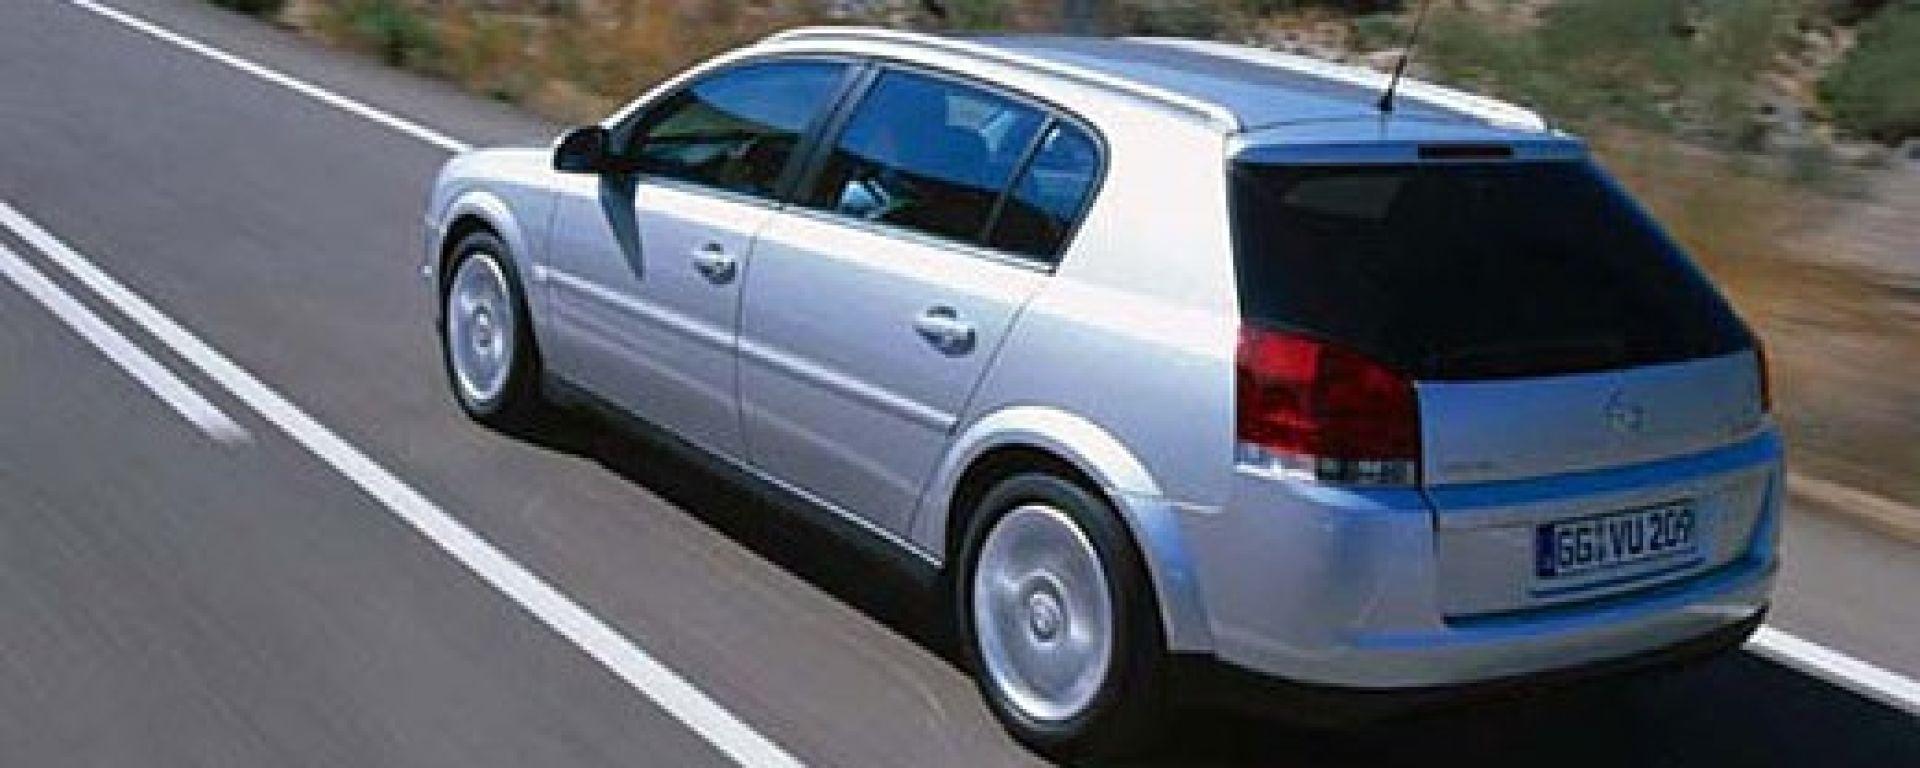 Le Opel si gasano